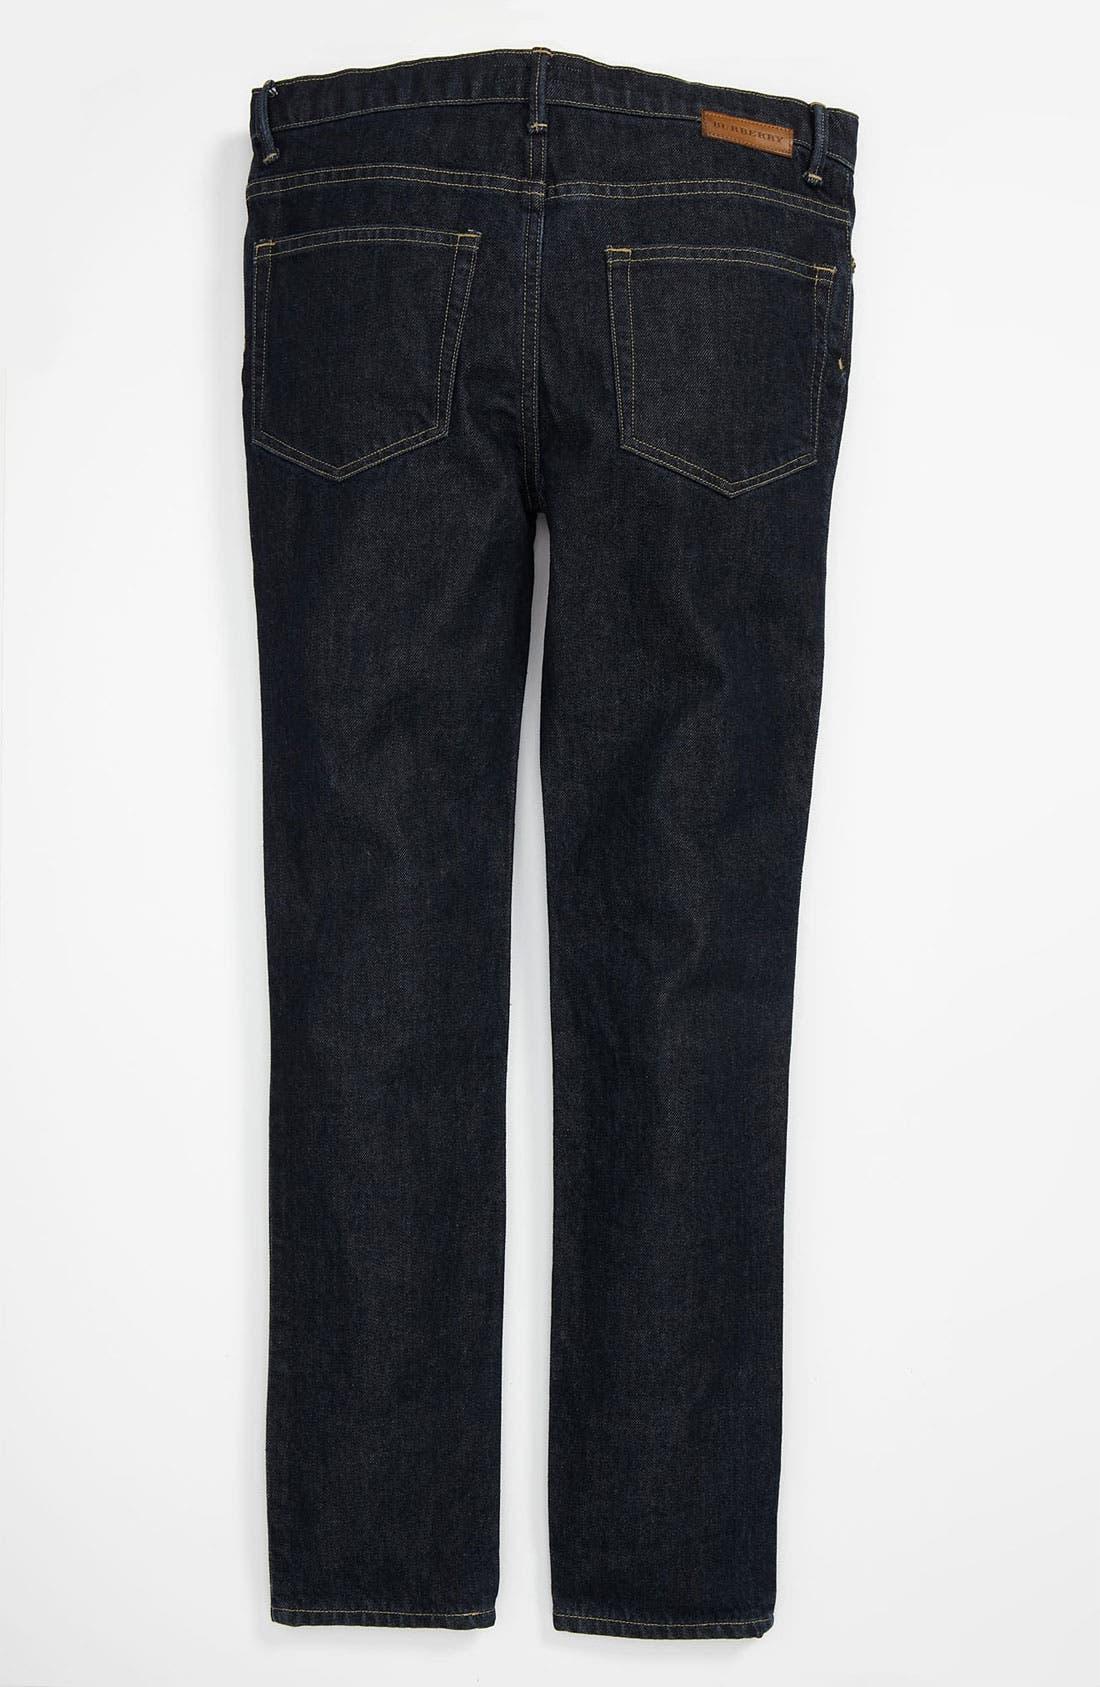 Alternate Image 1 Selected - Burberry Skinny Leg Jeans (Little Boys & Big Boys)